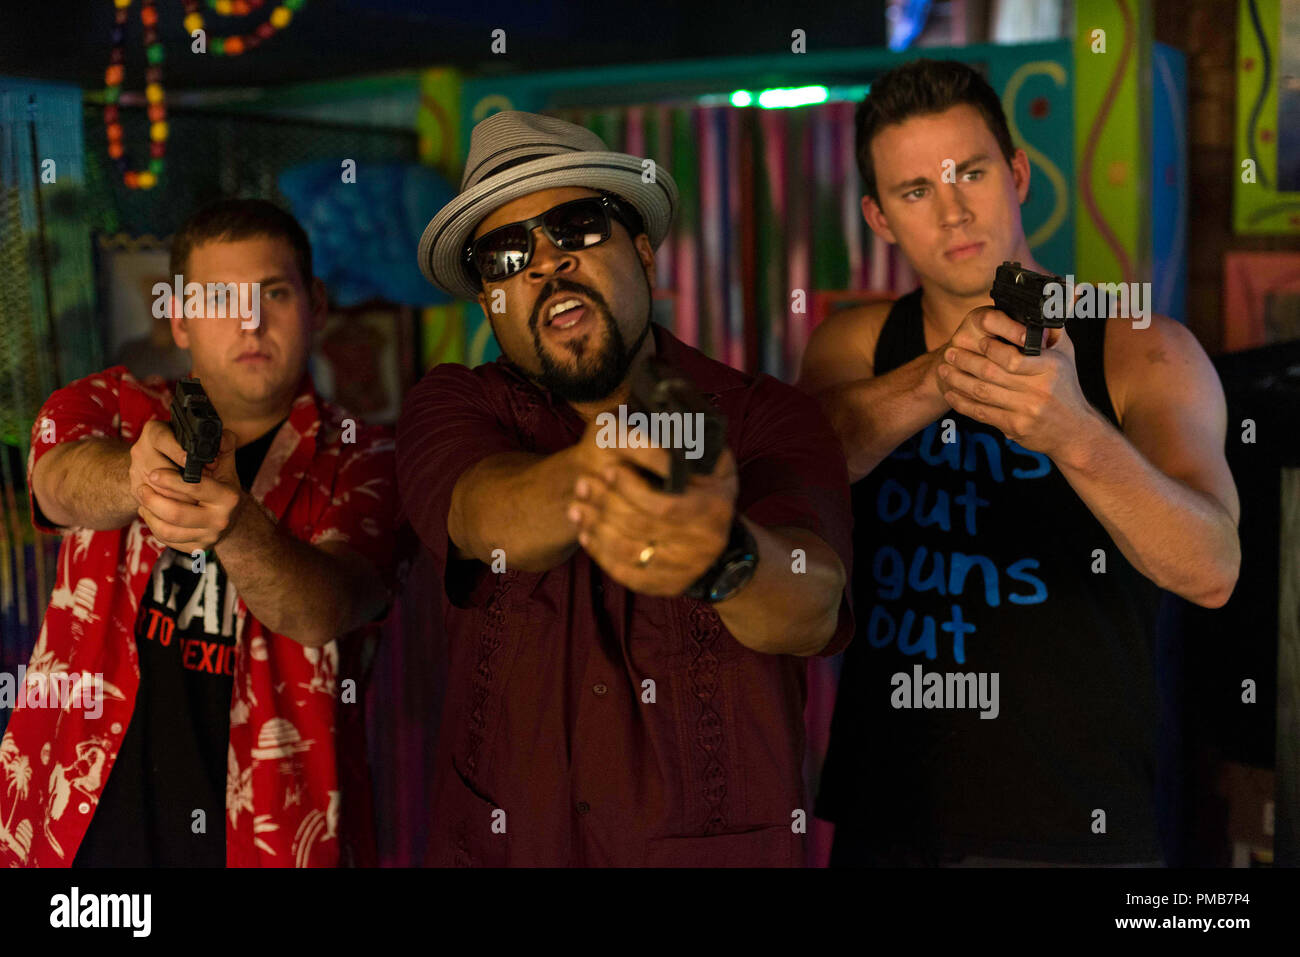 Schmidt (Jonah Hill) y Jenko (Channing Tatum) con Dickson (cubo de hielo) enfrentan los malos en Columbia Pictures' '22 Jump Street'. Imagen De Stock